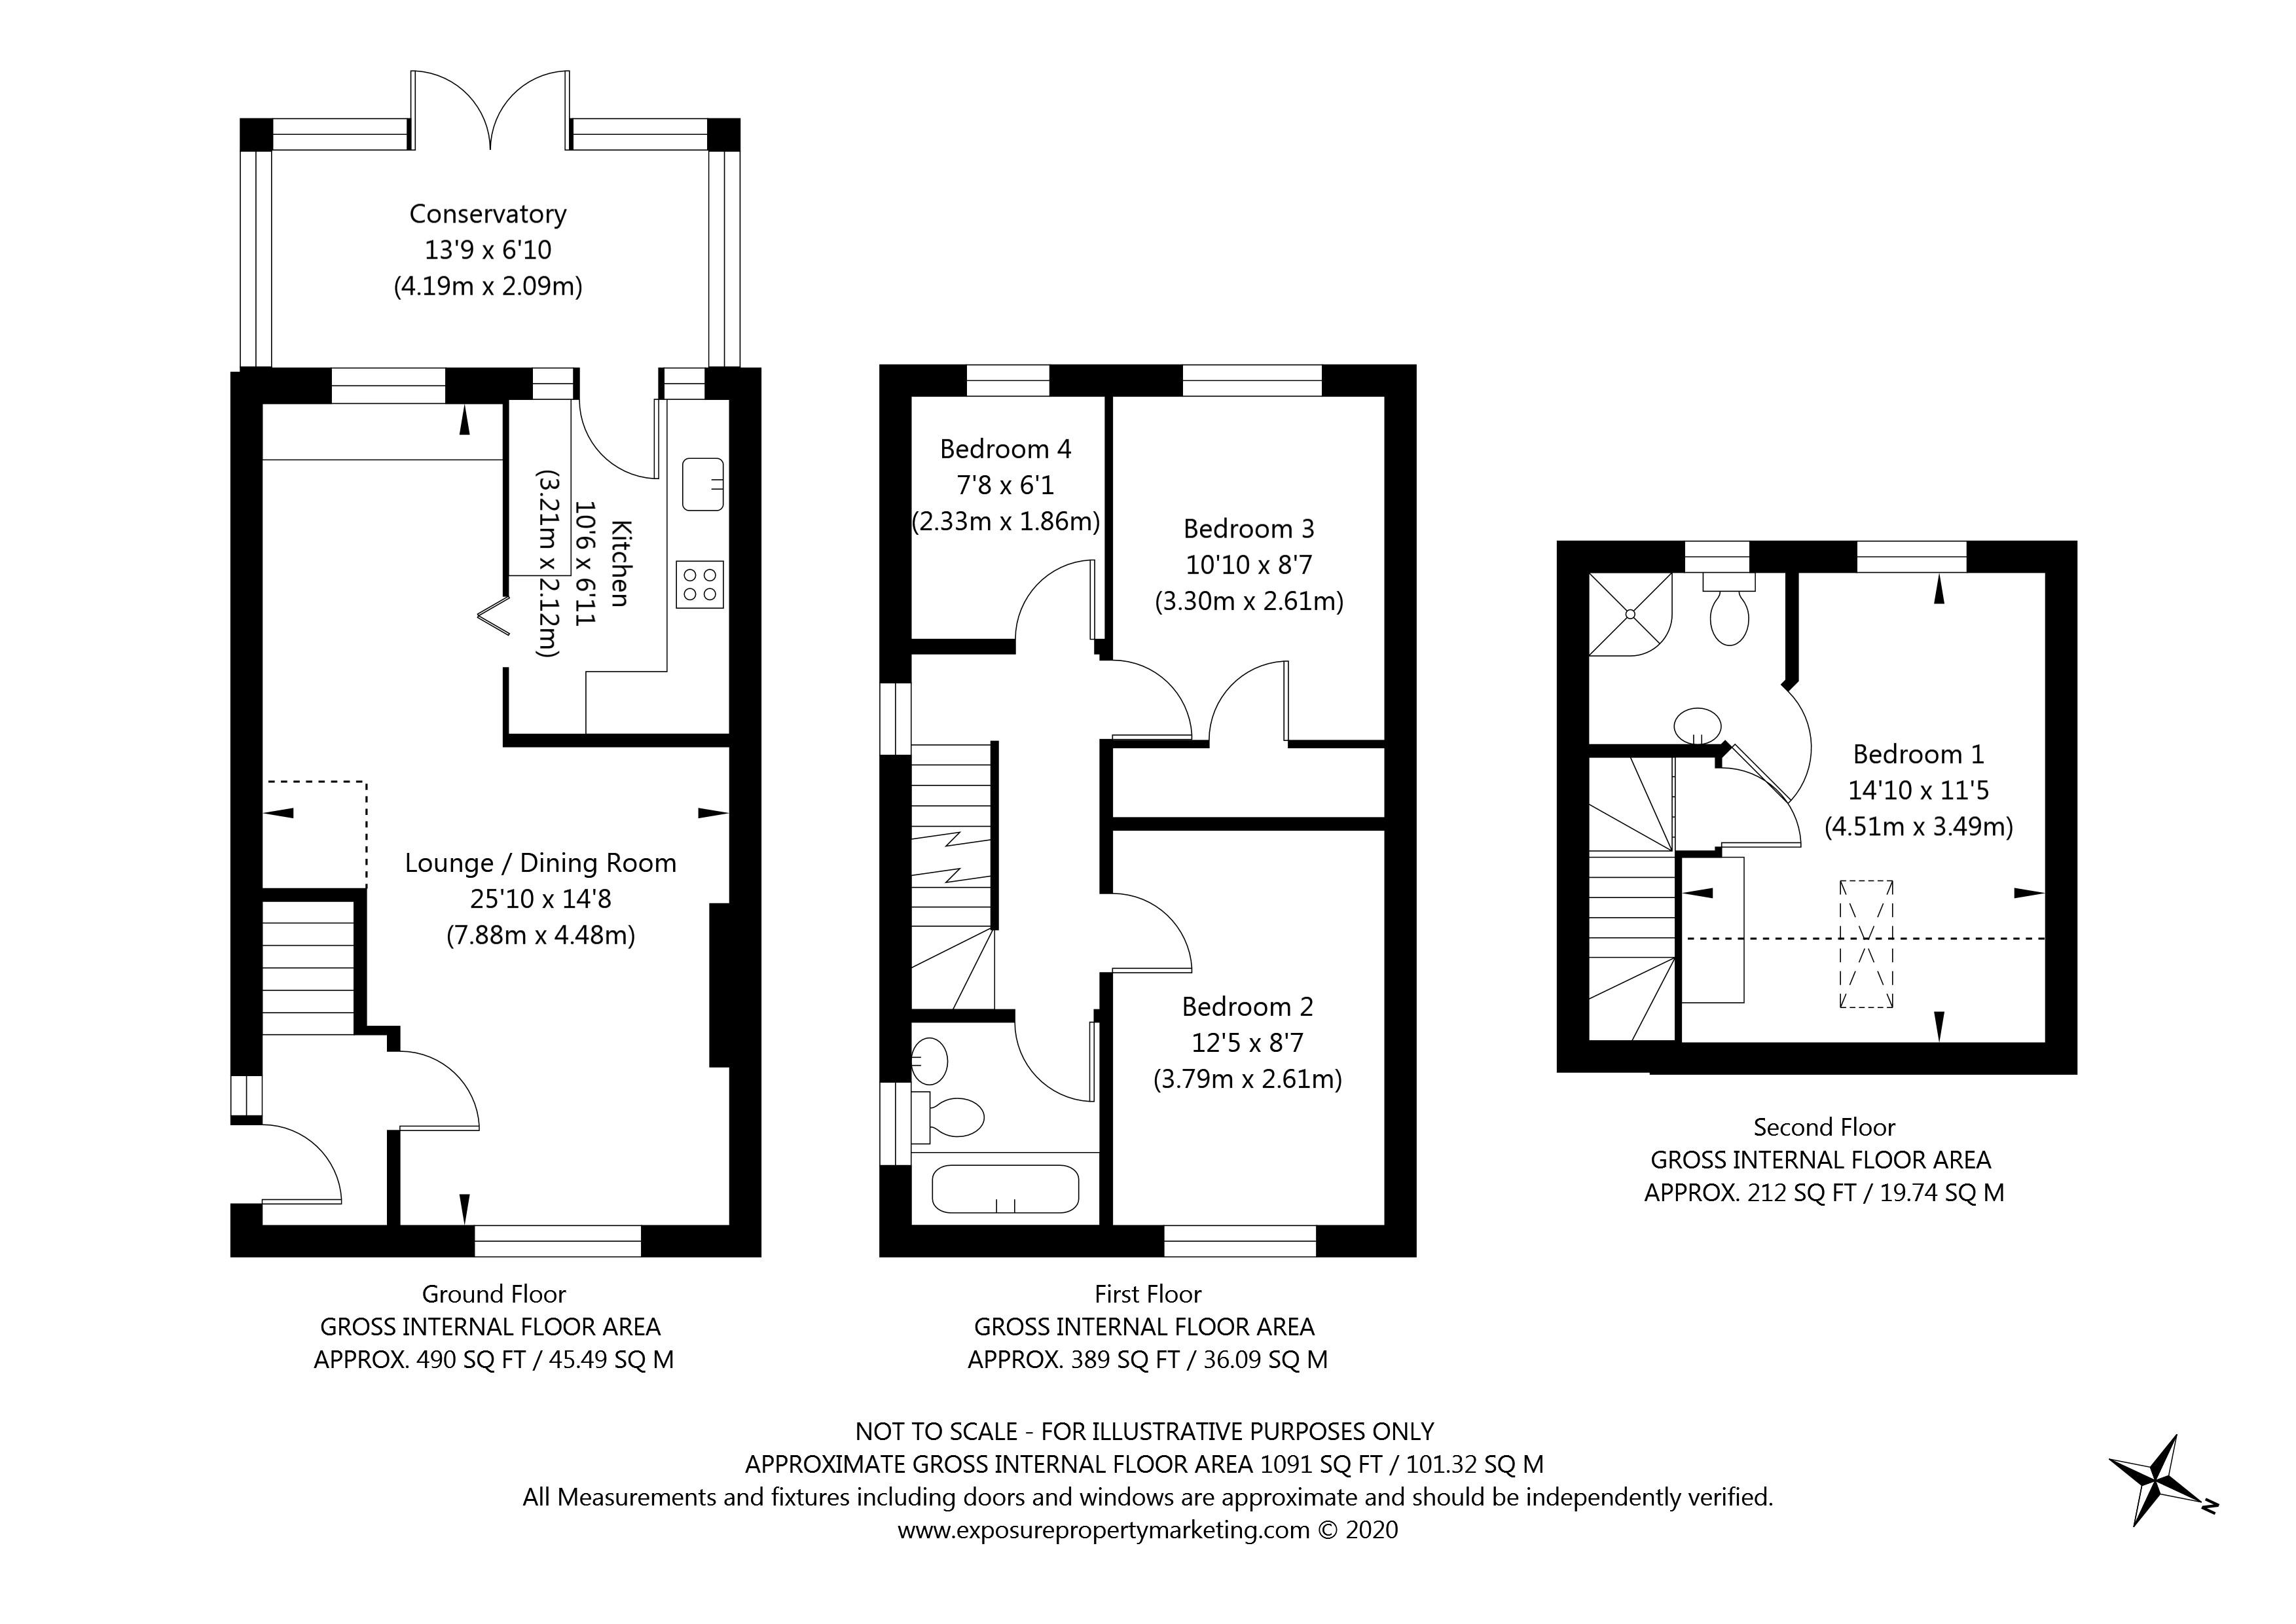 Chelkar Way, York property floorplan